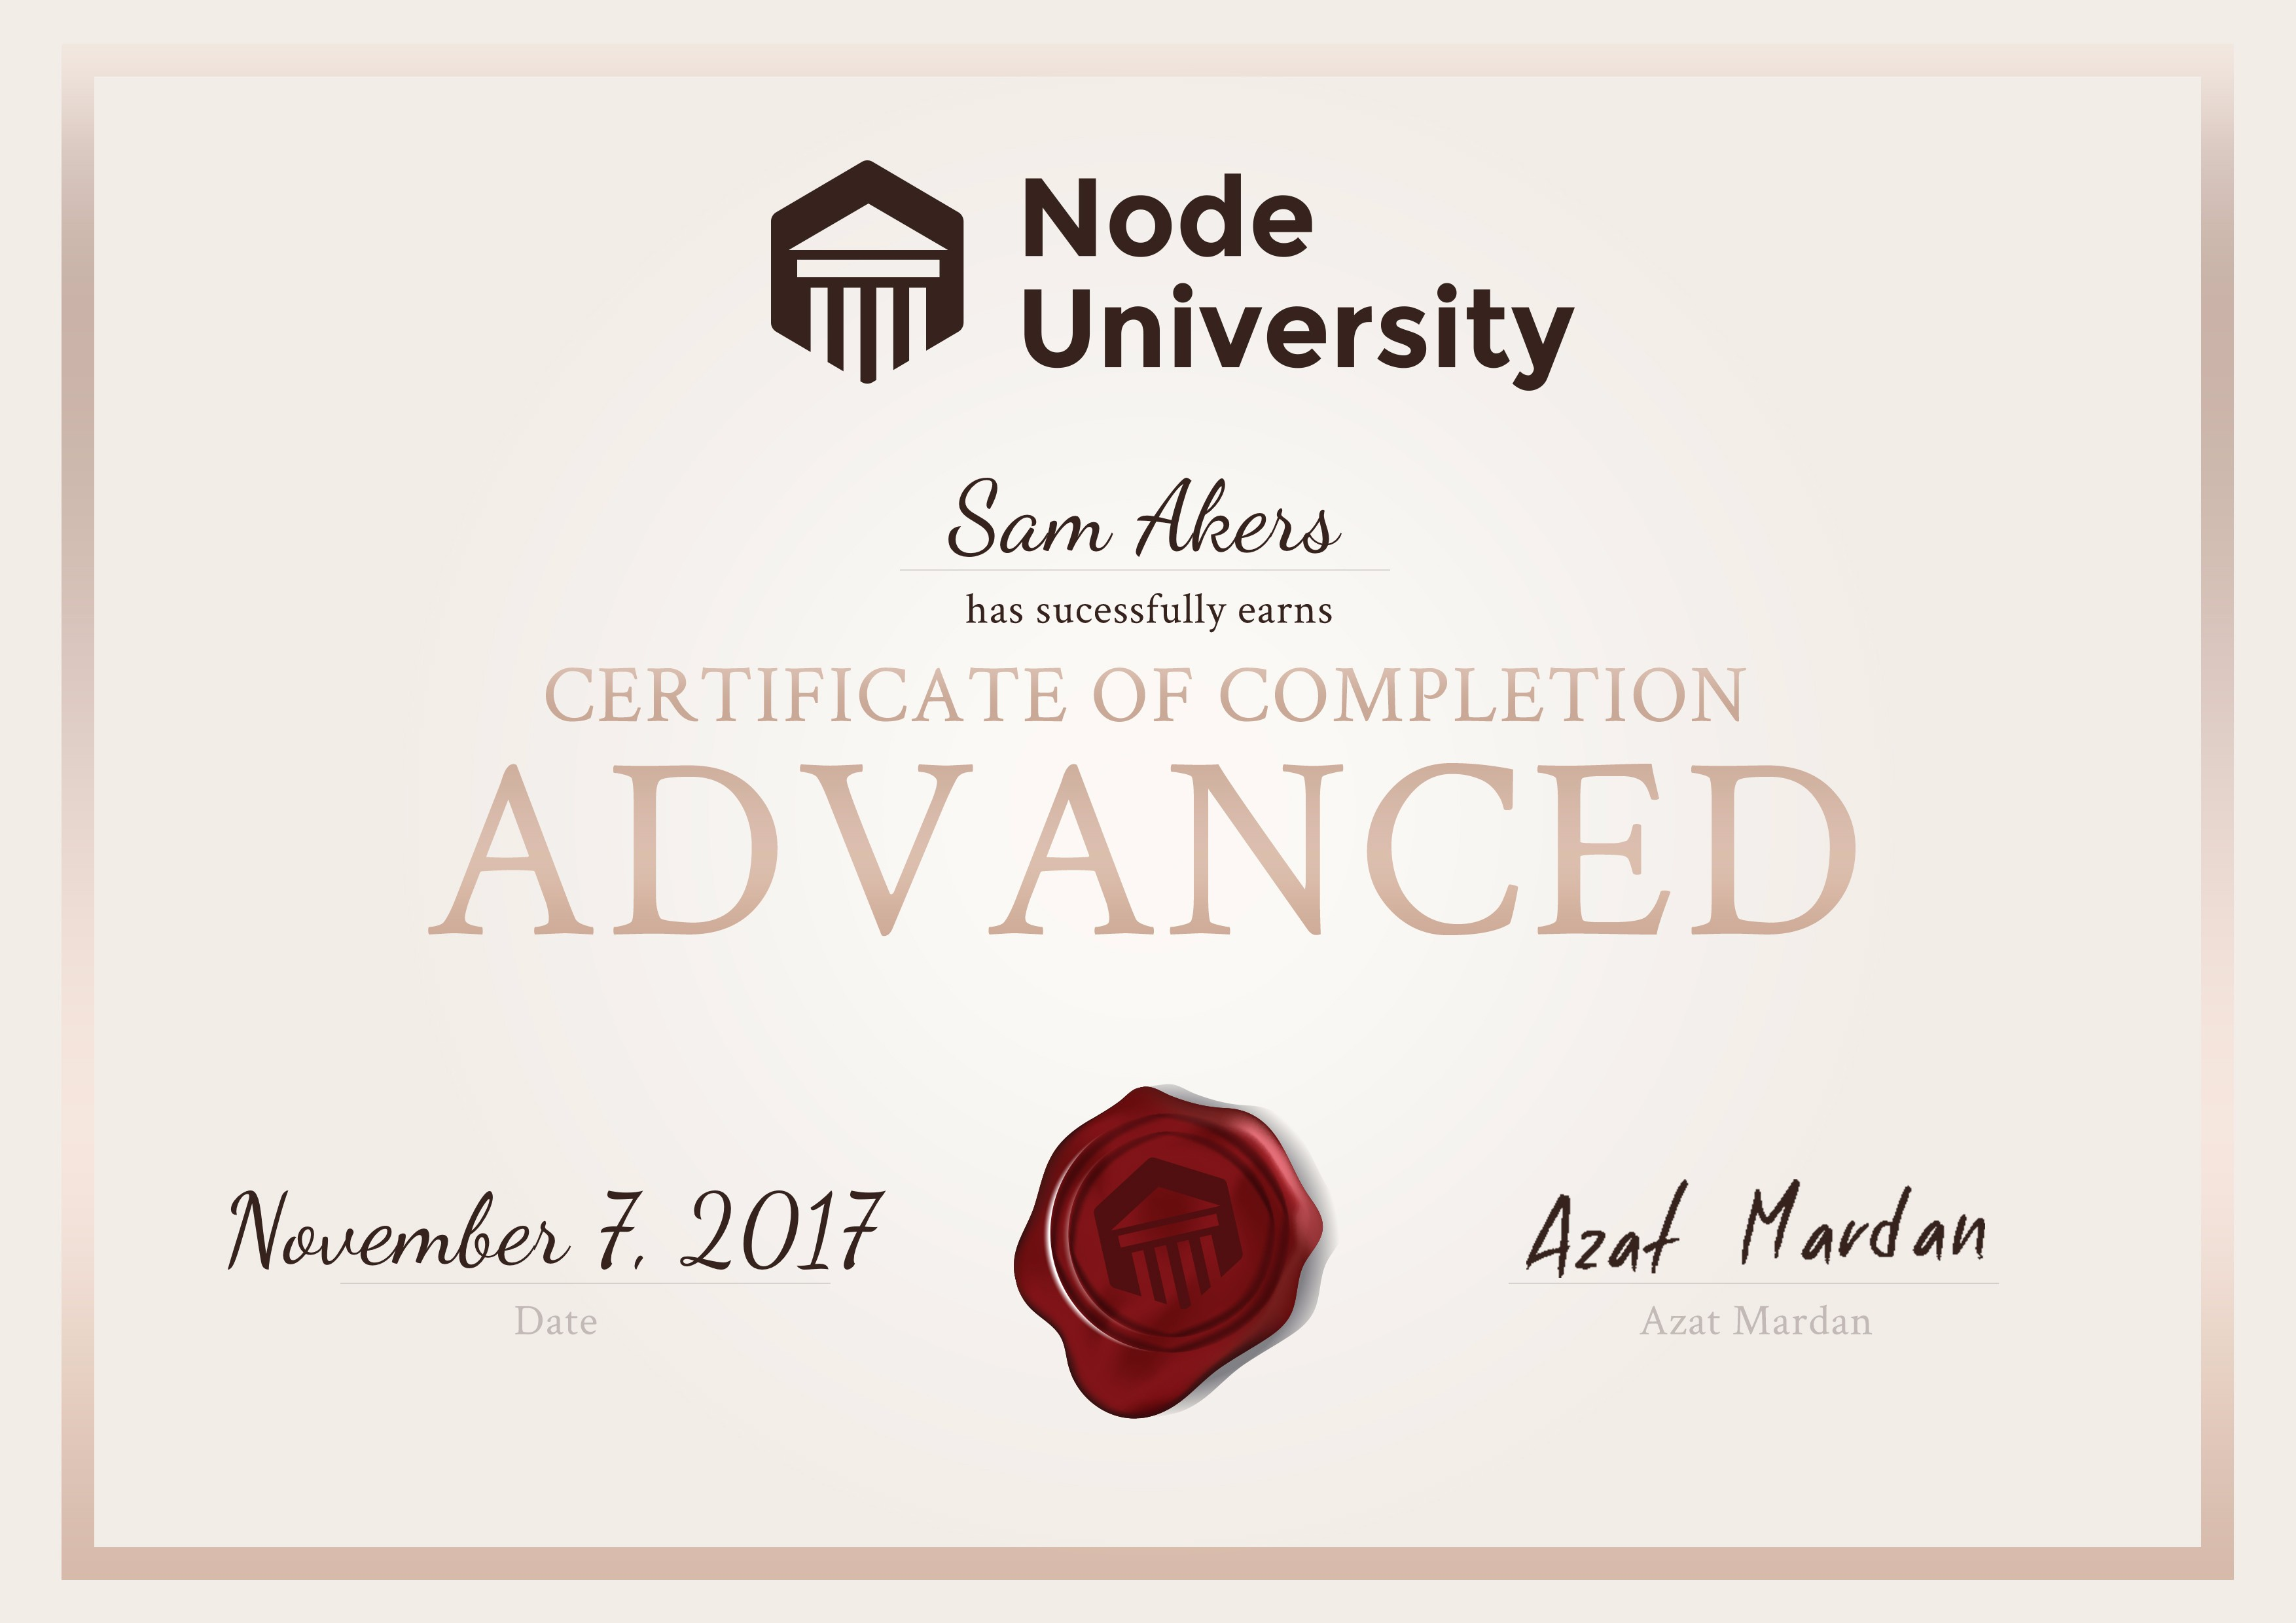 Membership For The Best Nodejs Content Node University Courses On